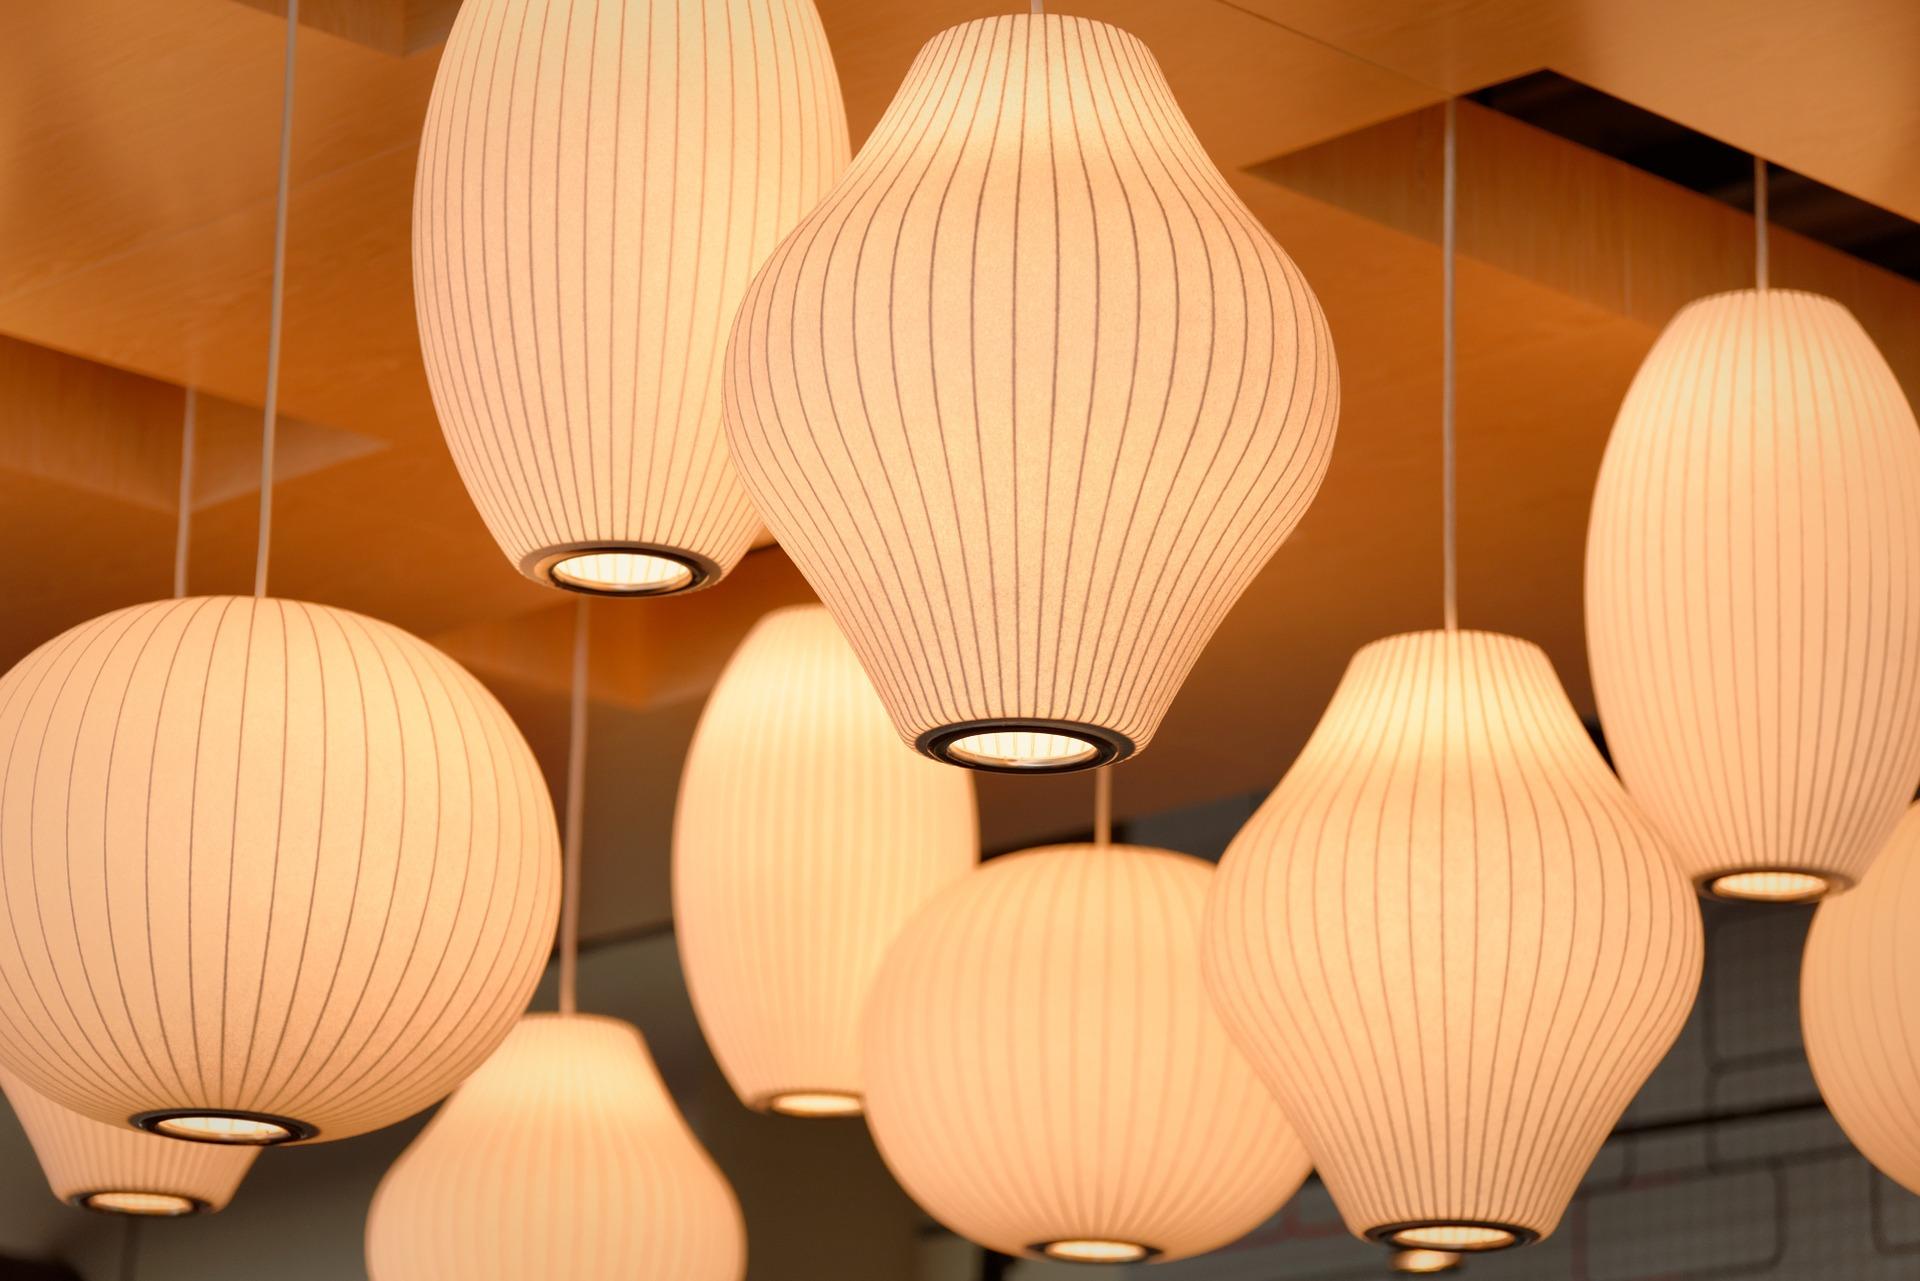 Ideas para limpiar fácilmente las lámparas de casa